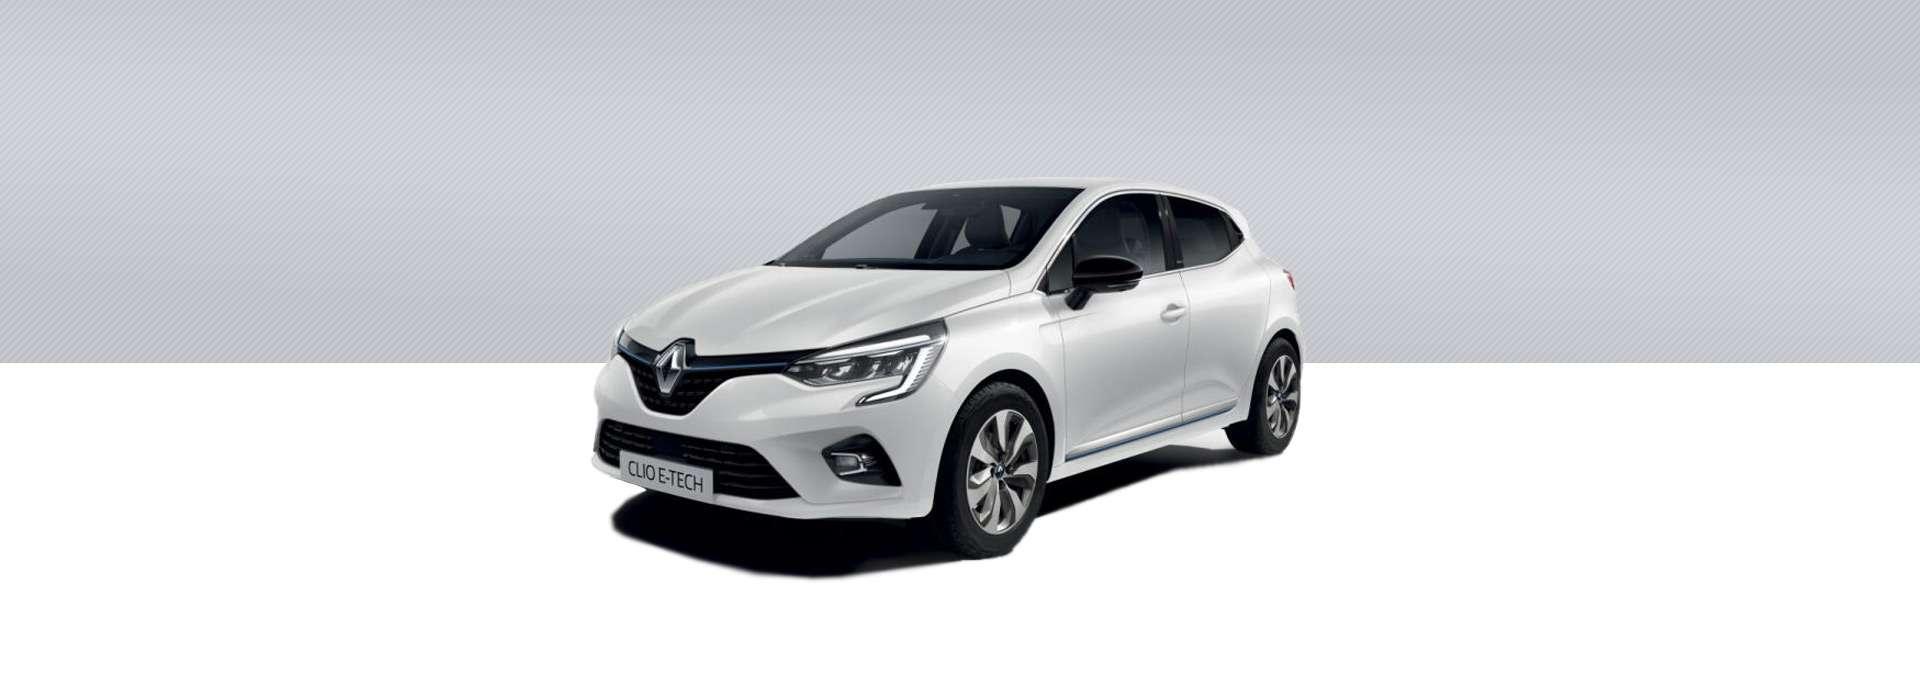 Renault NUEVO CLIO E-TECH